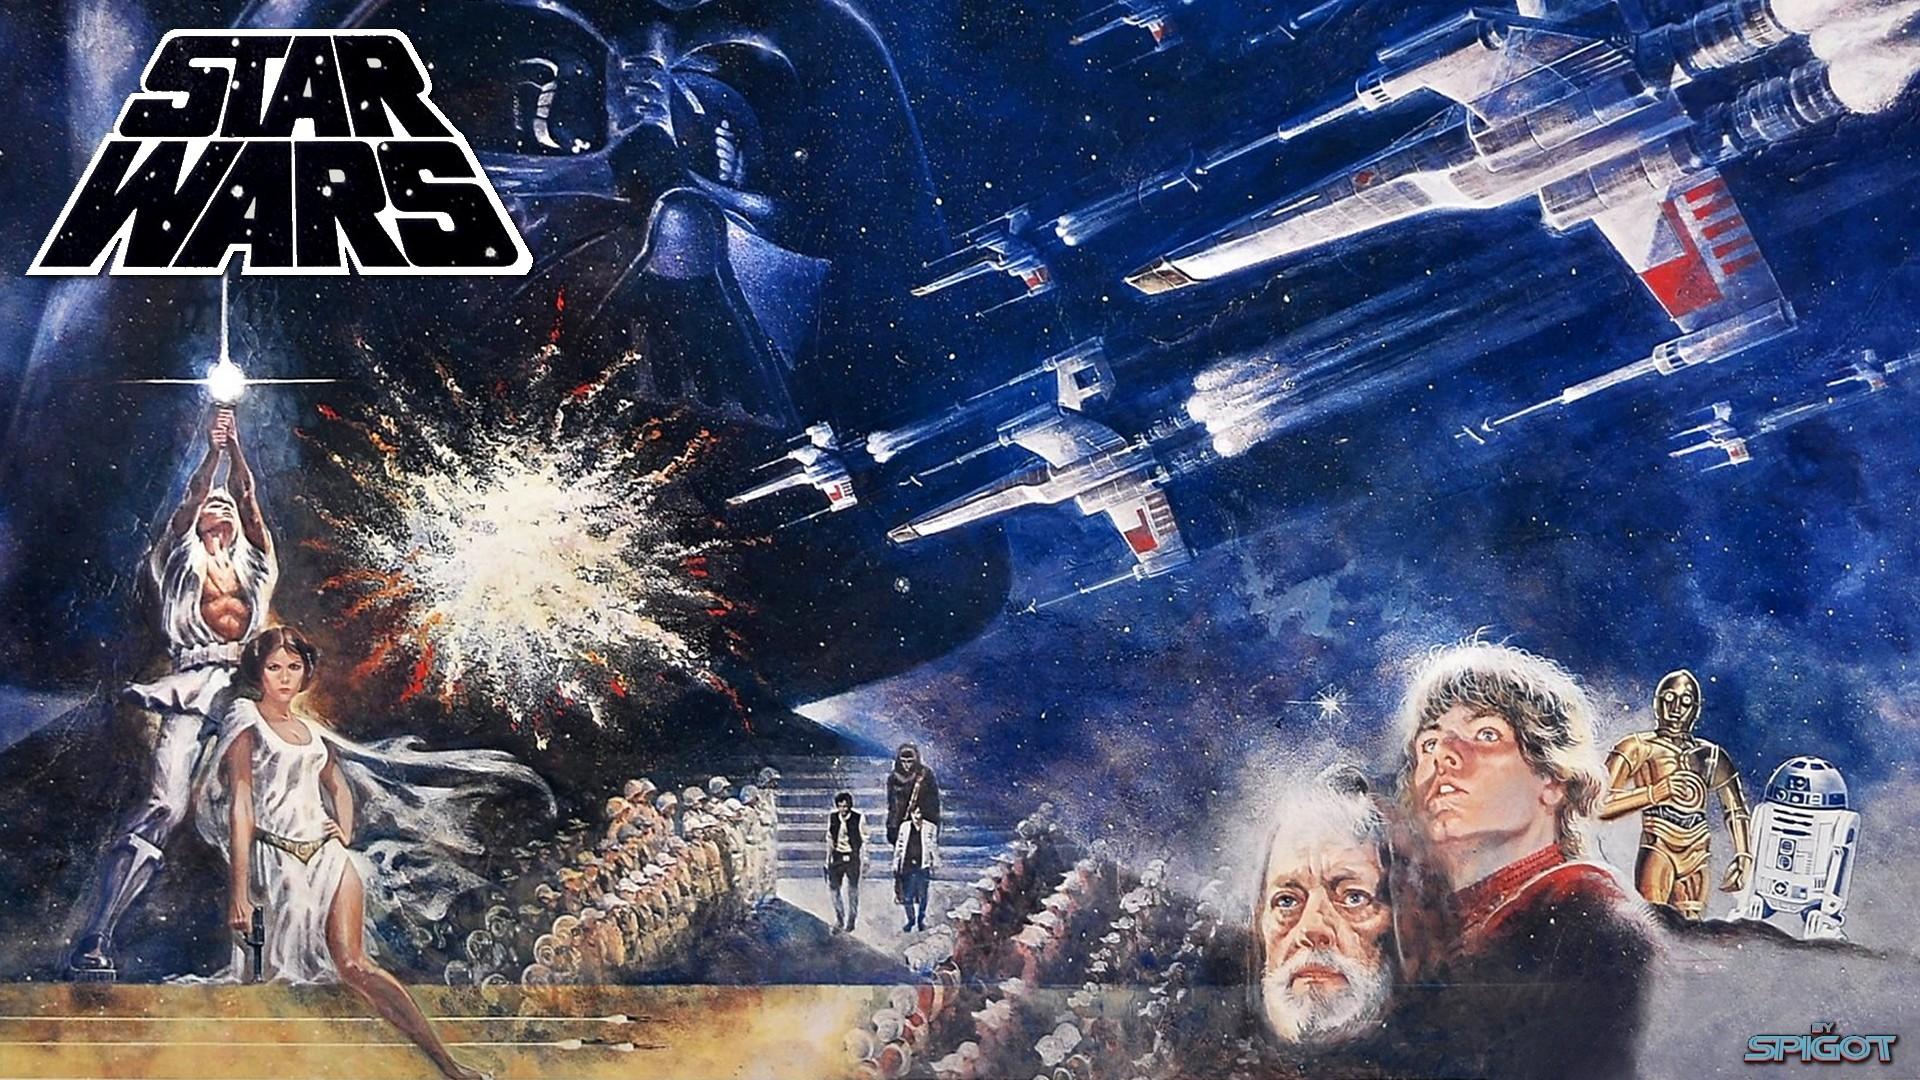 Another Star Wars Wallpaper George Spigot S Blog